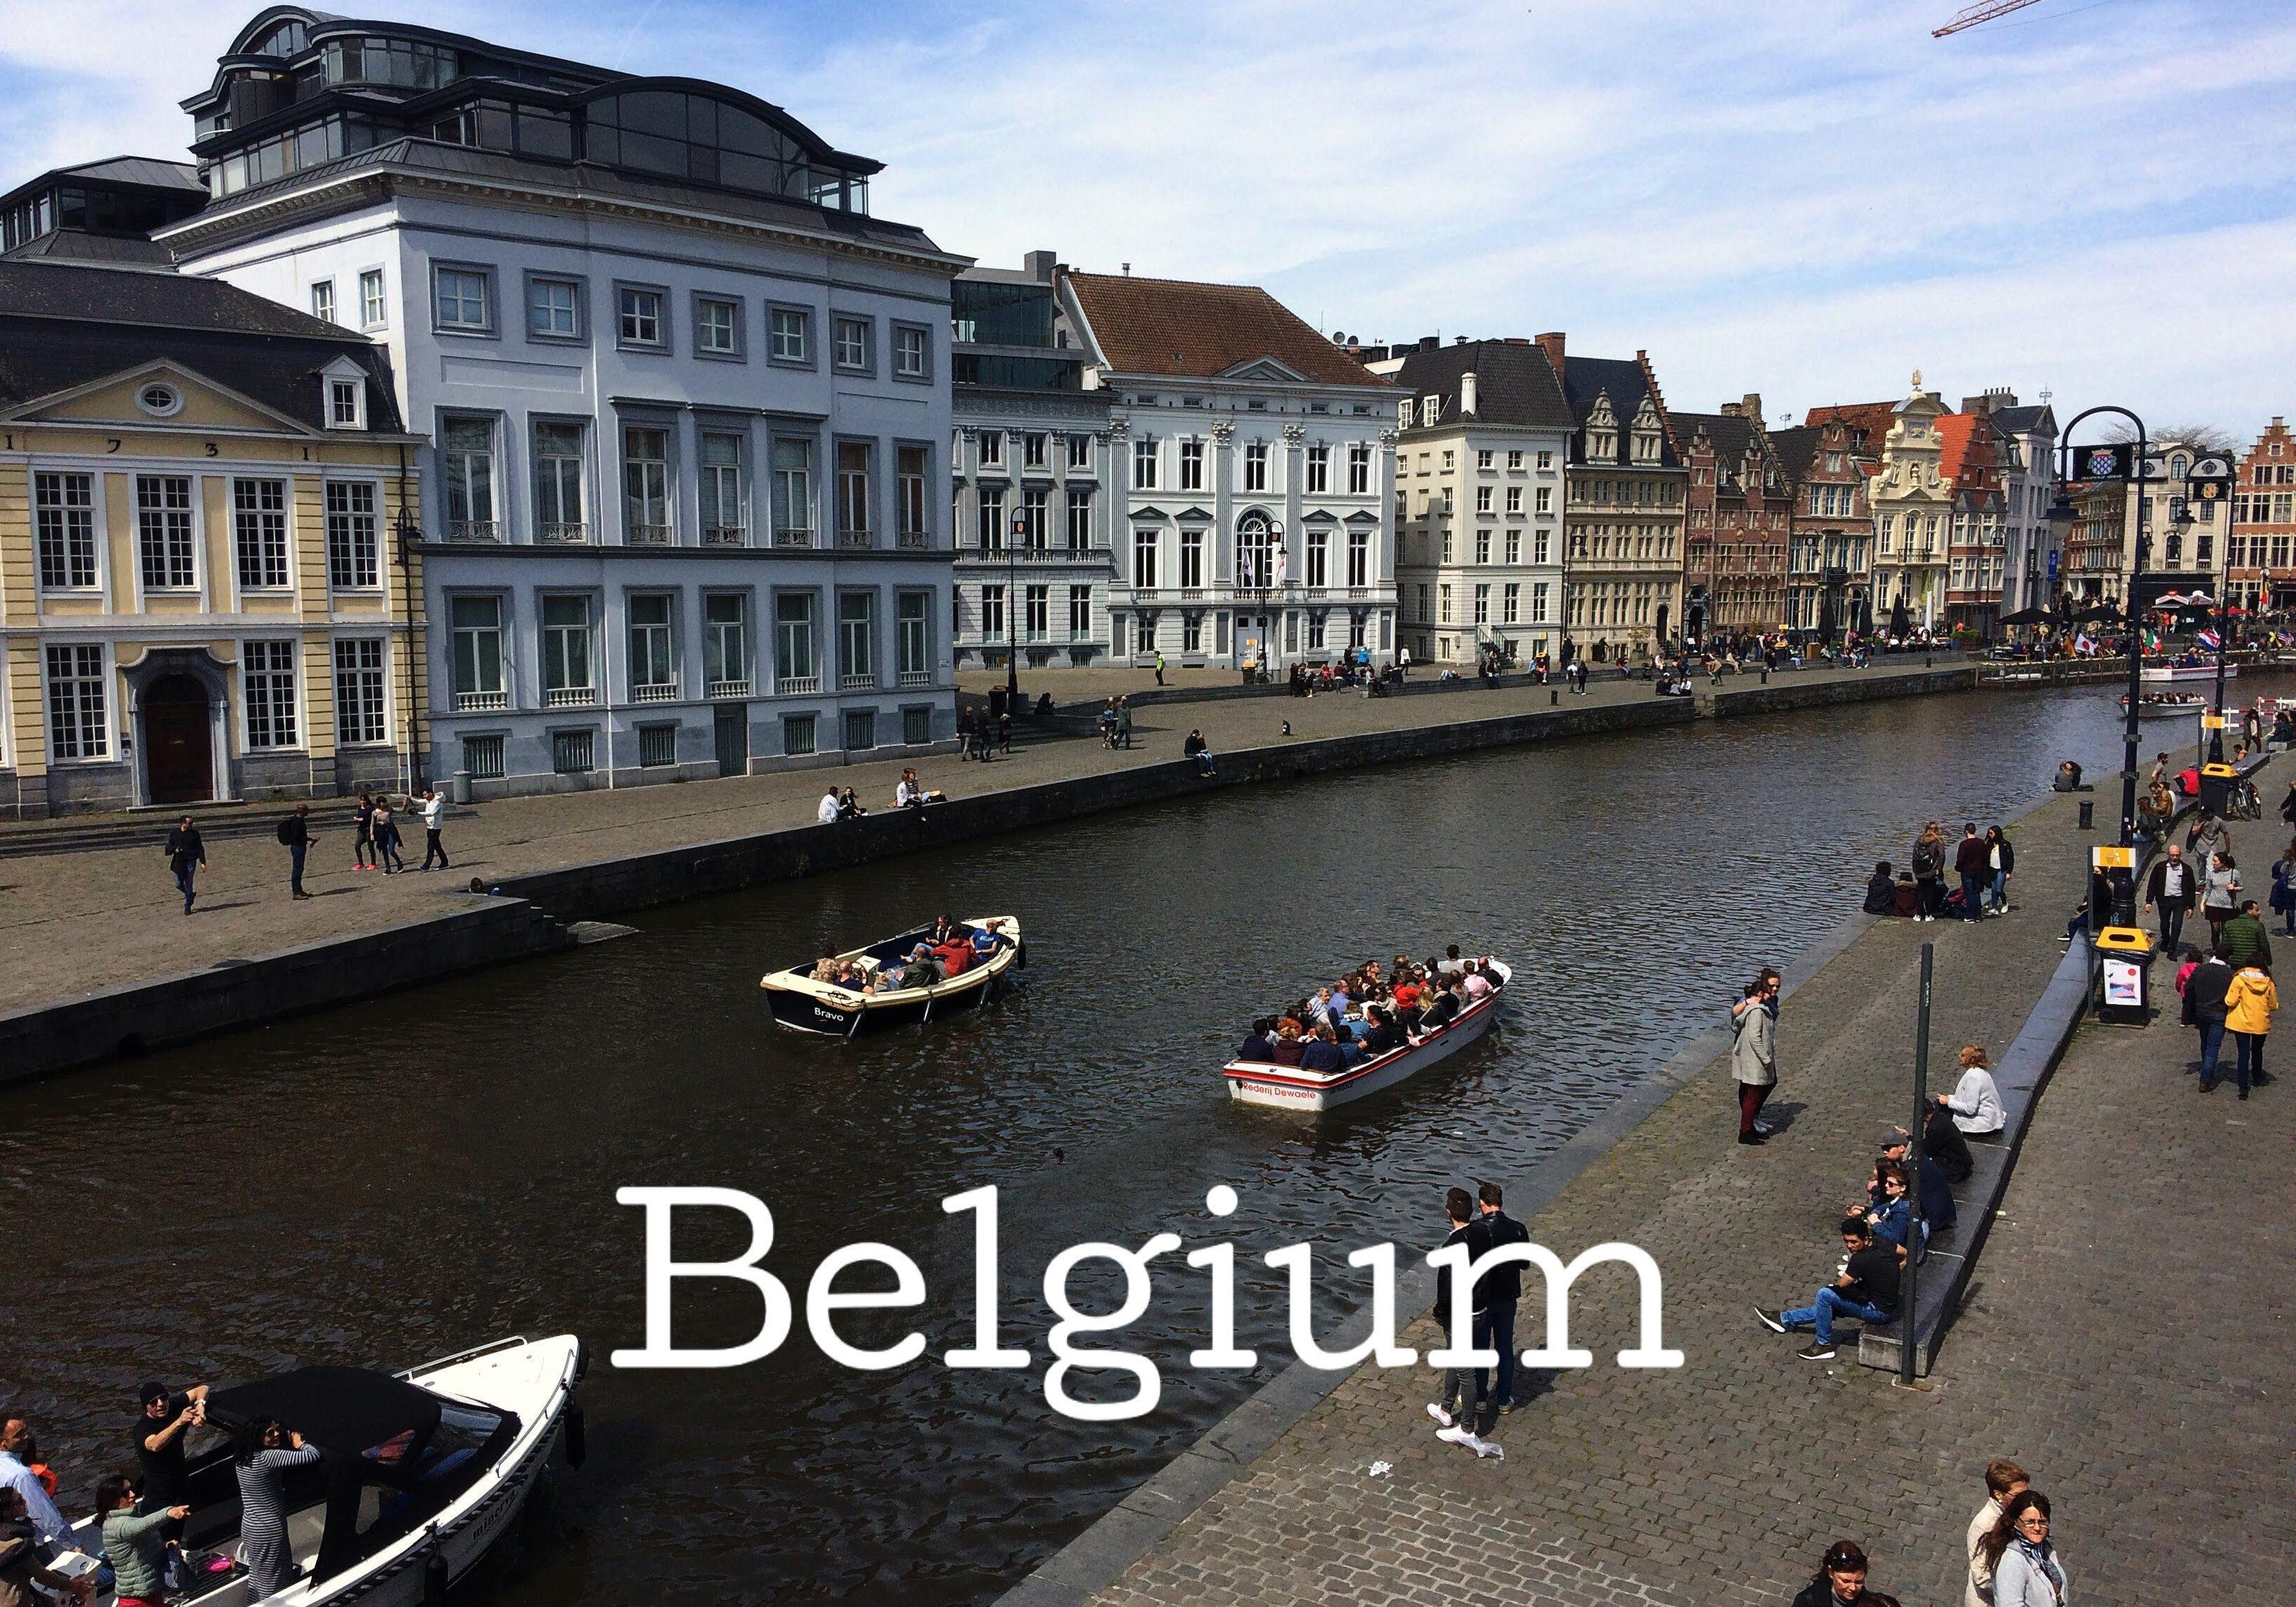 Belgium, wanderdaze, blog, travelling, travel blog,